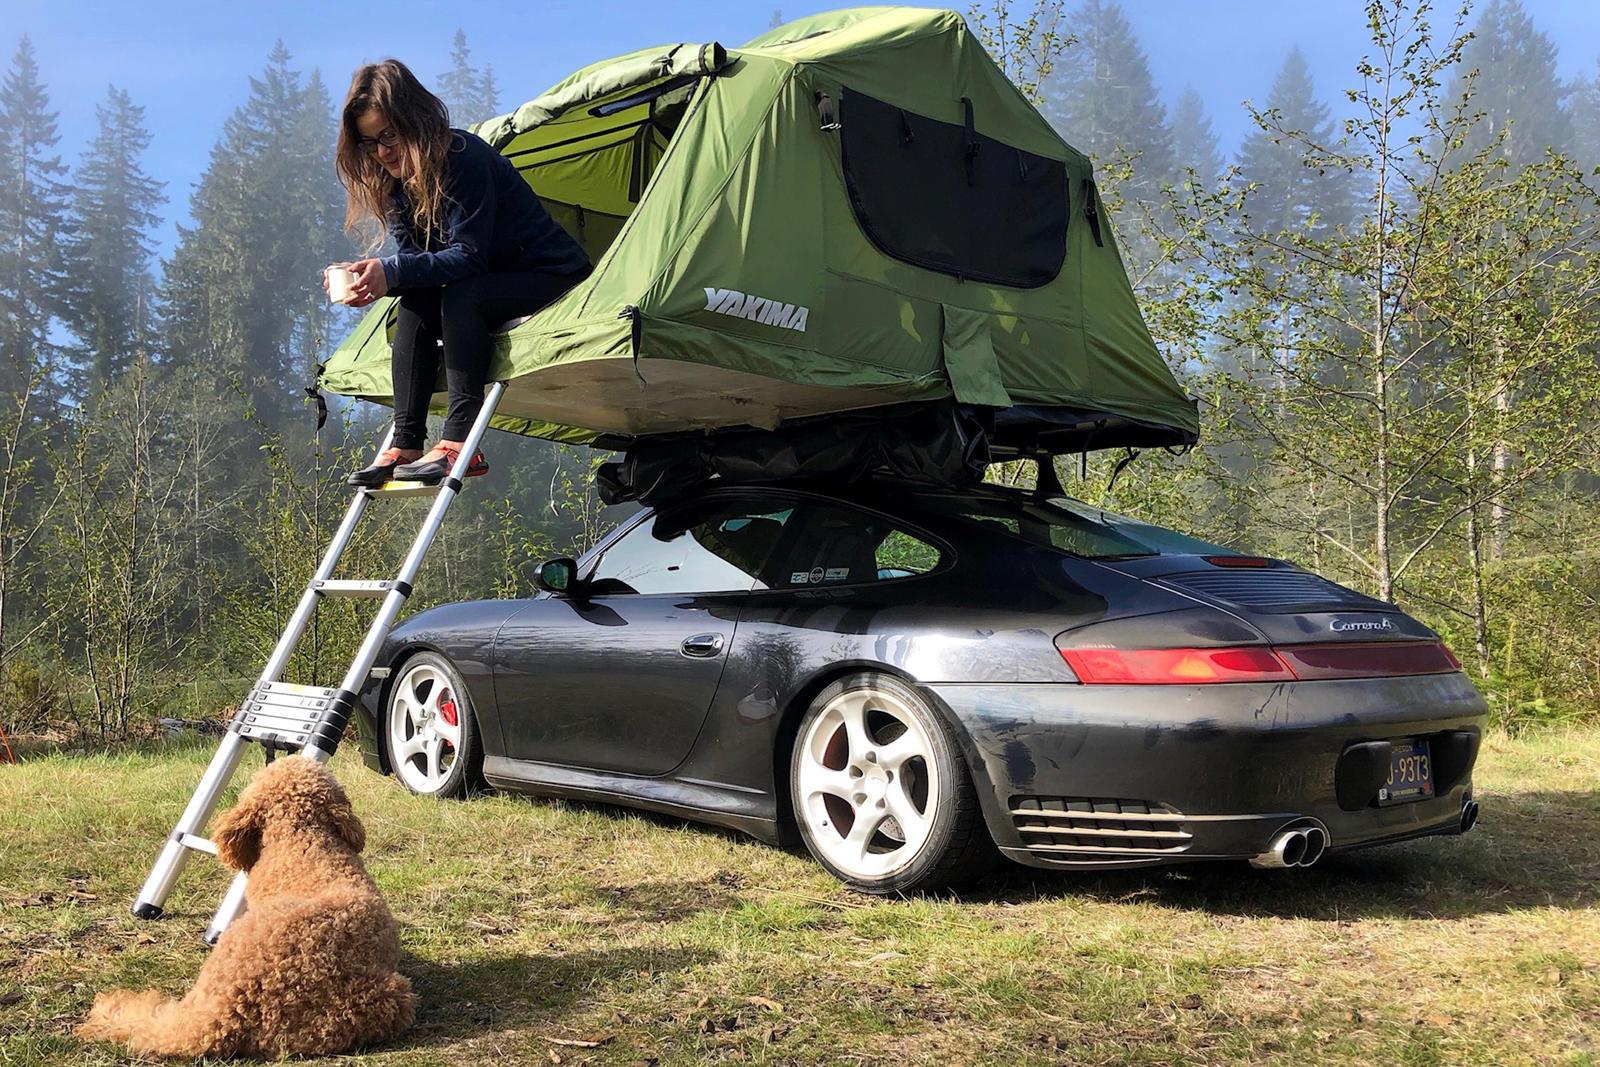 Porsche Approves Of This Crazy 911 Camper